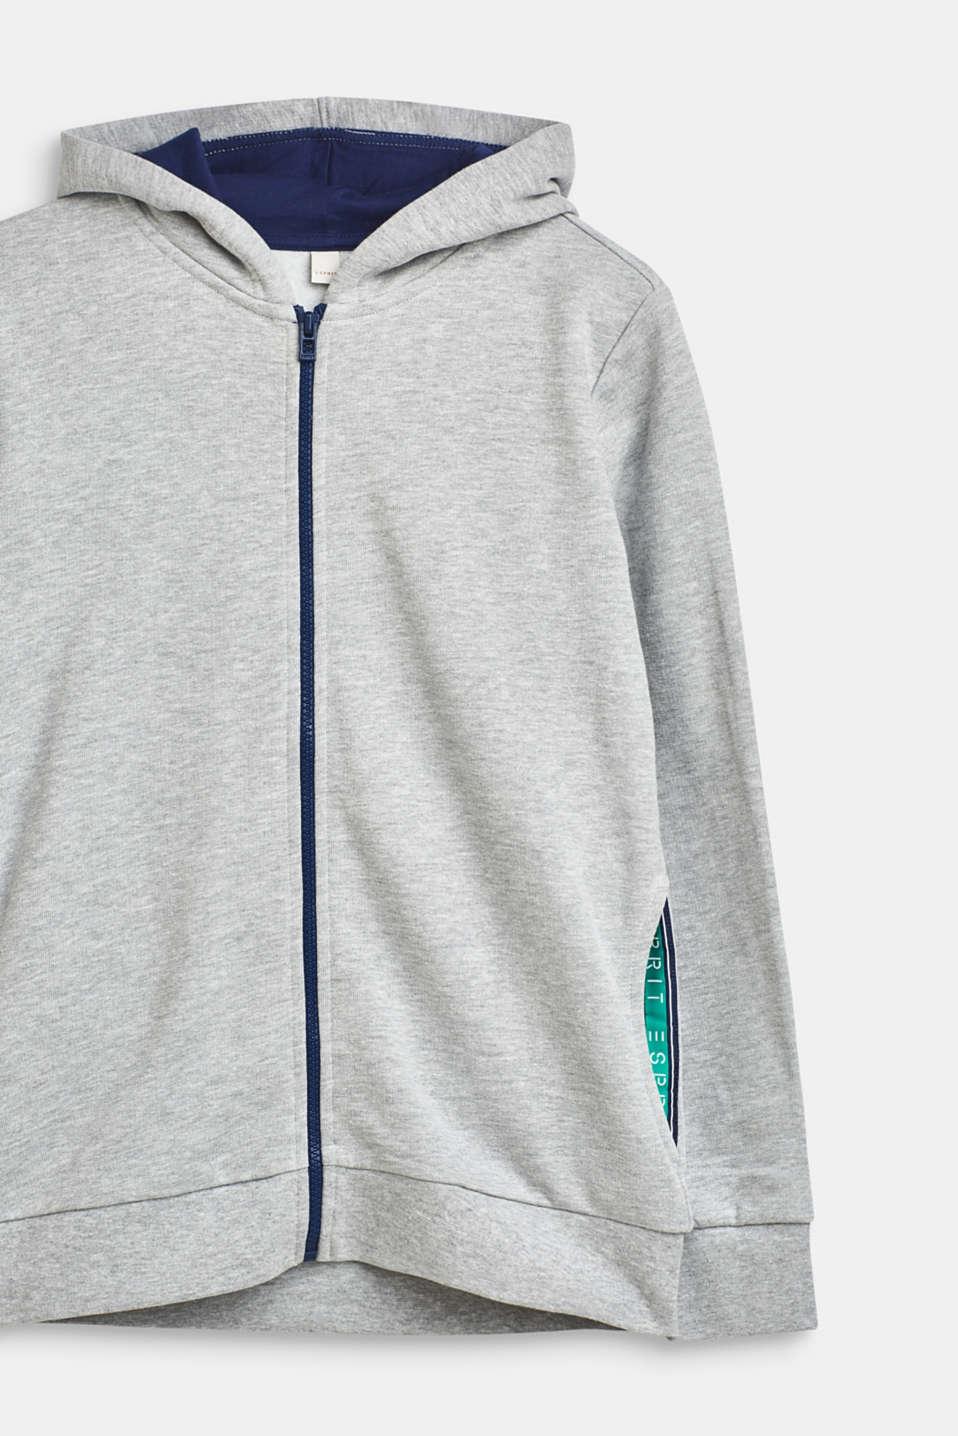 Sweatshirts cardigan, LCHEATHER SILVER, detail image number 2